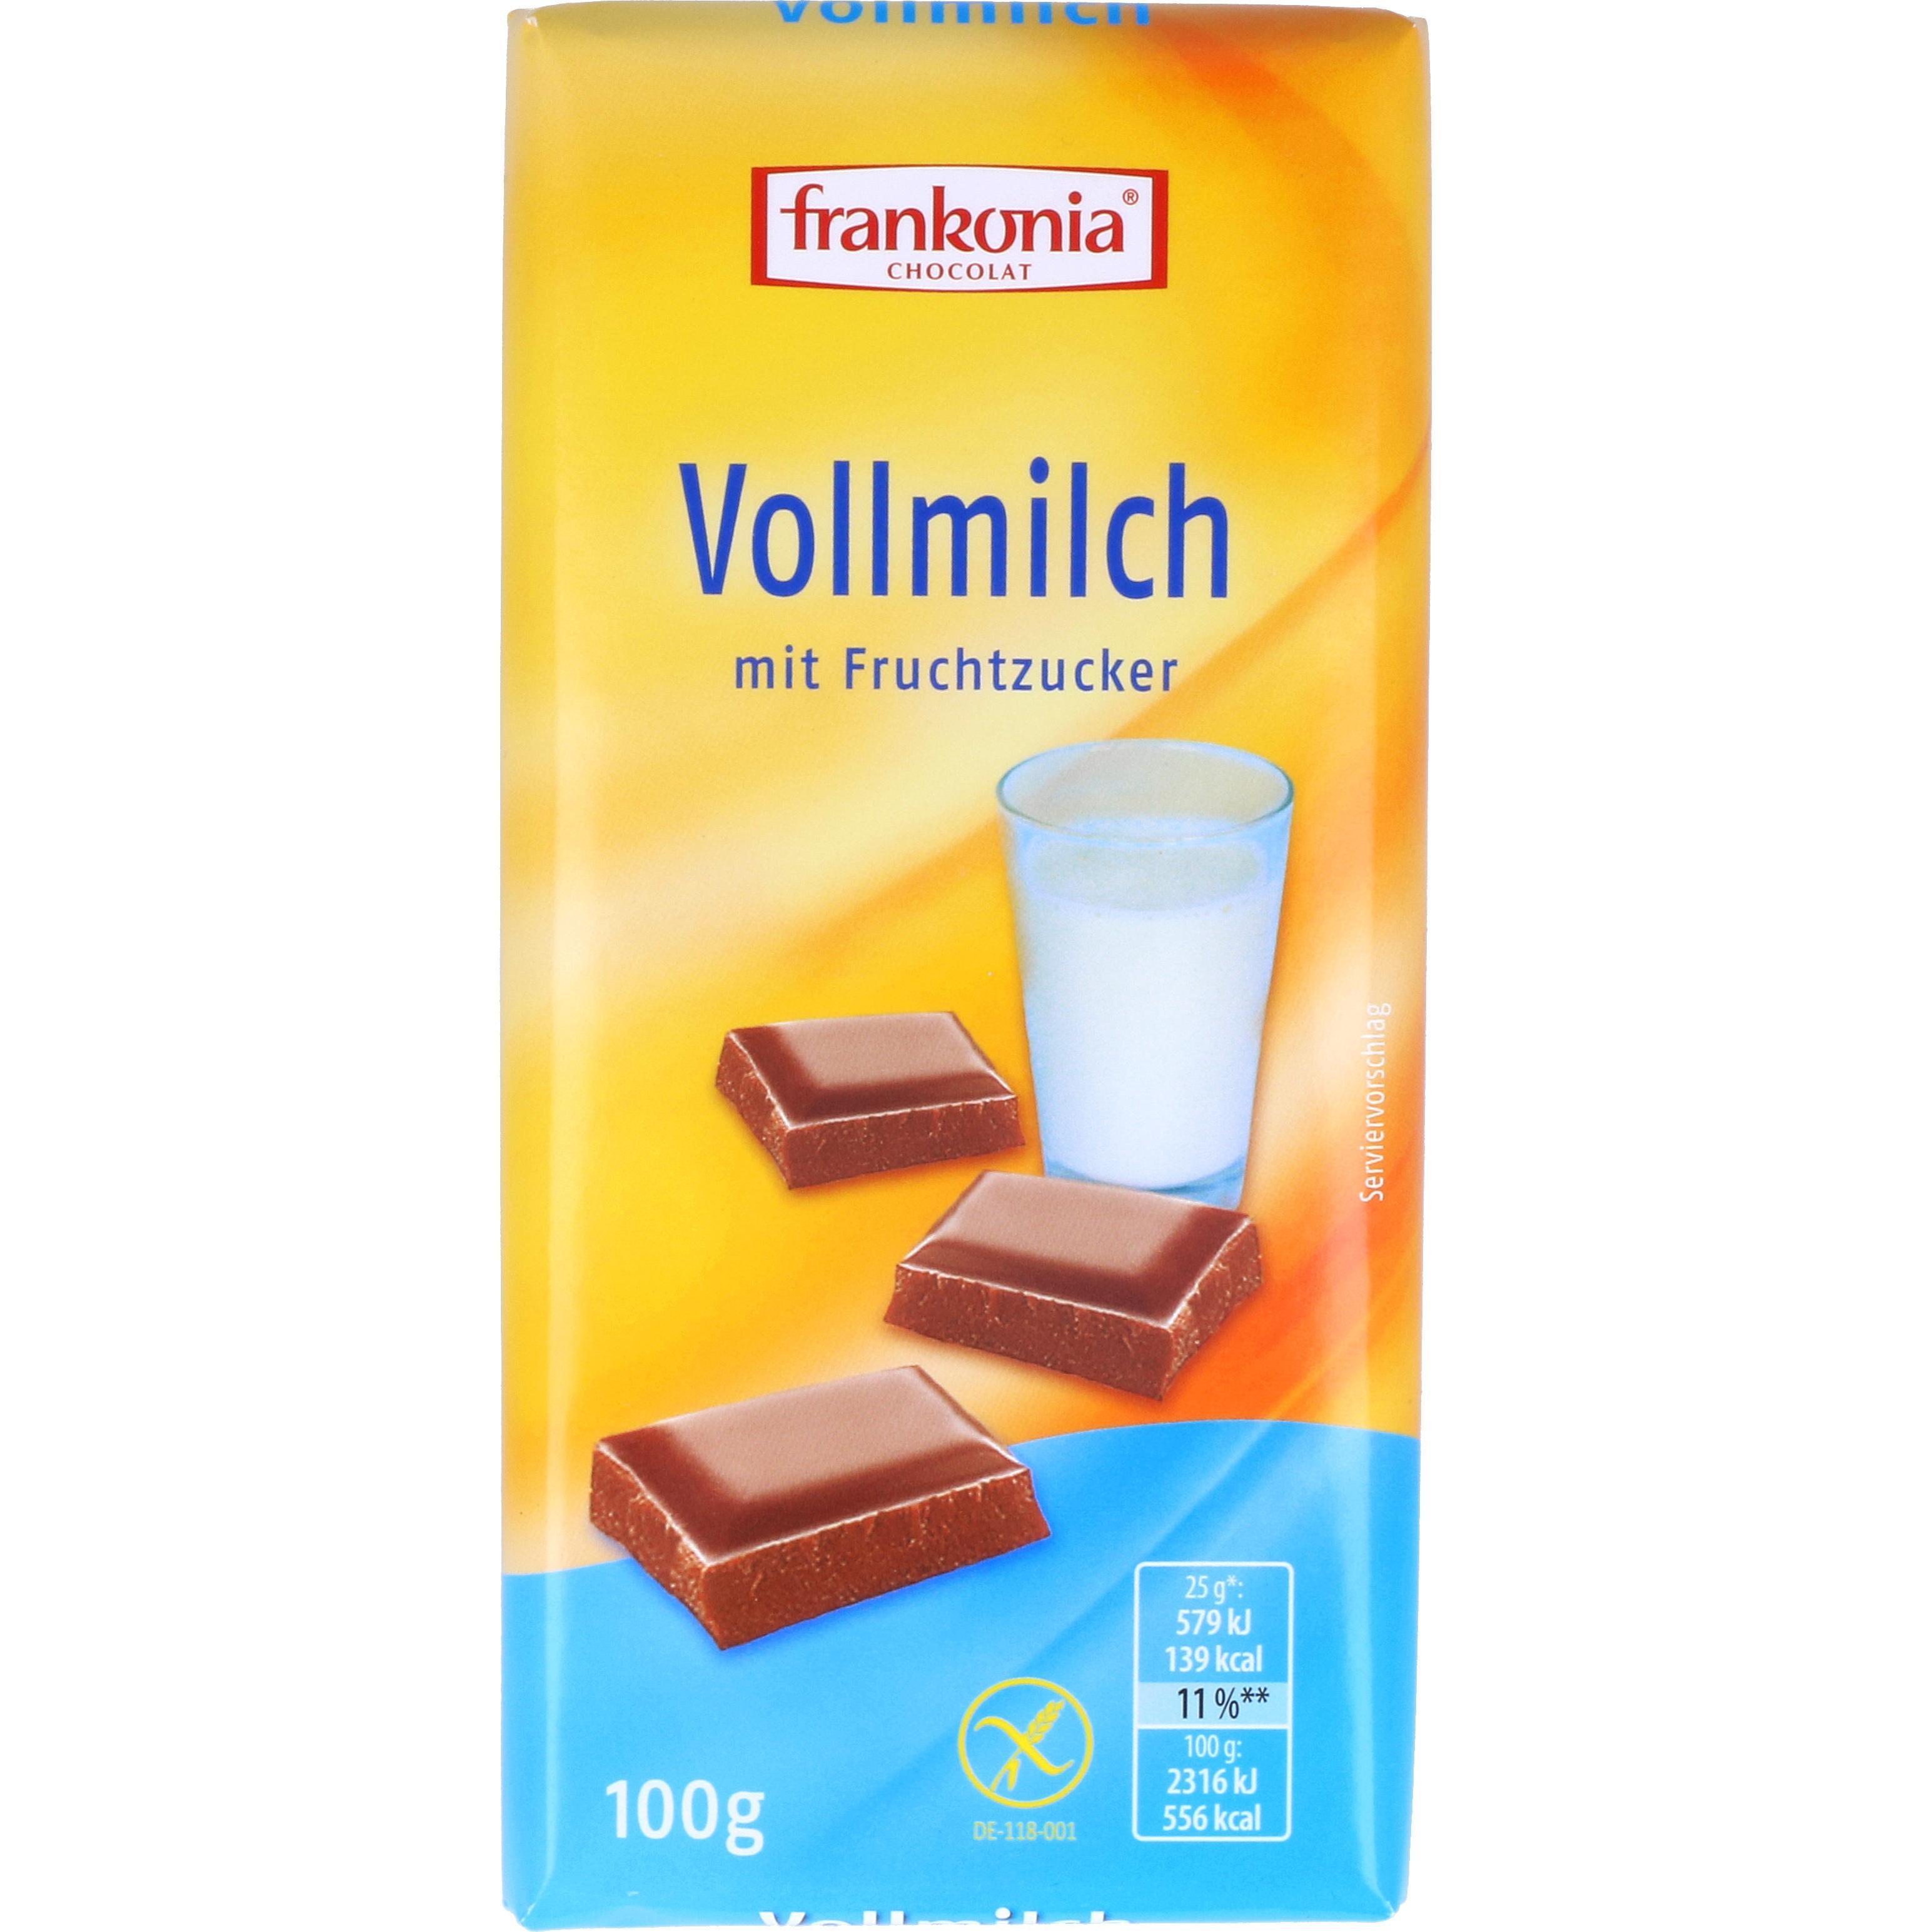 Frankonia Vollmilch Schokolade 100g